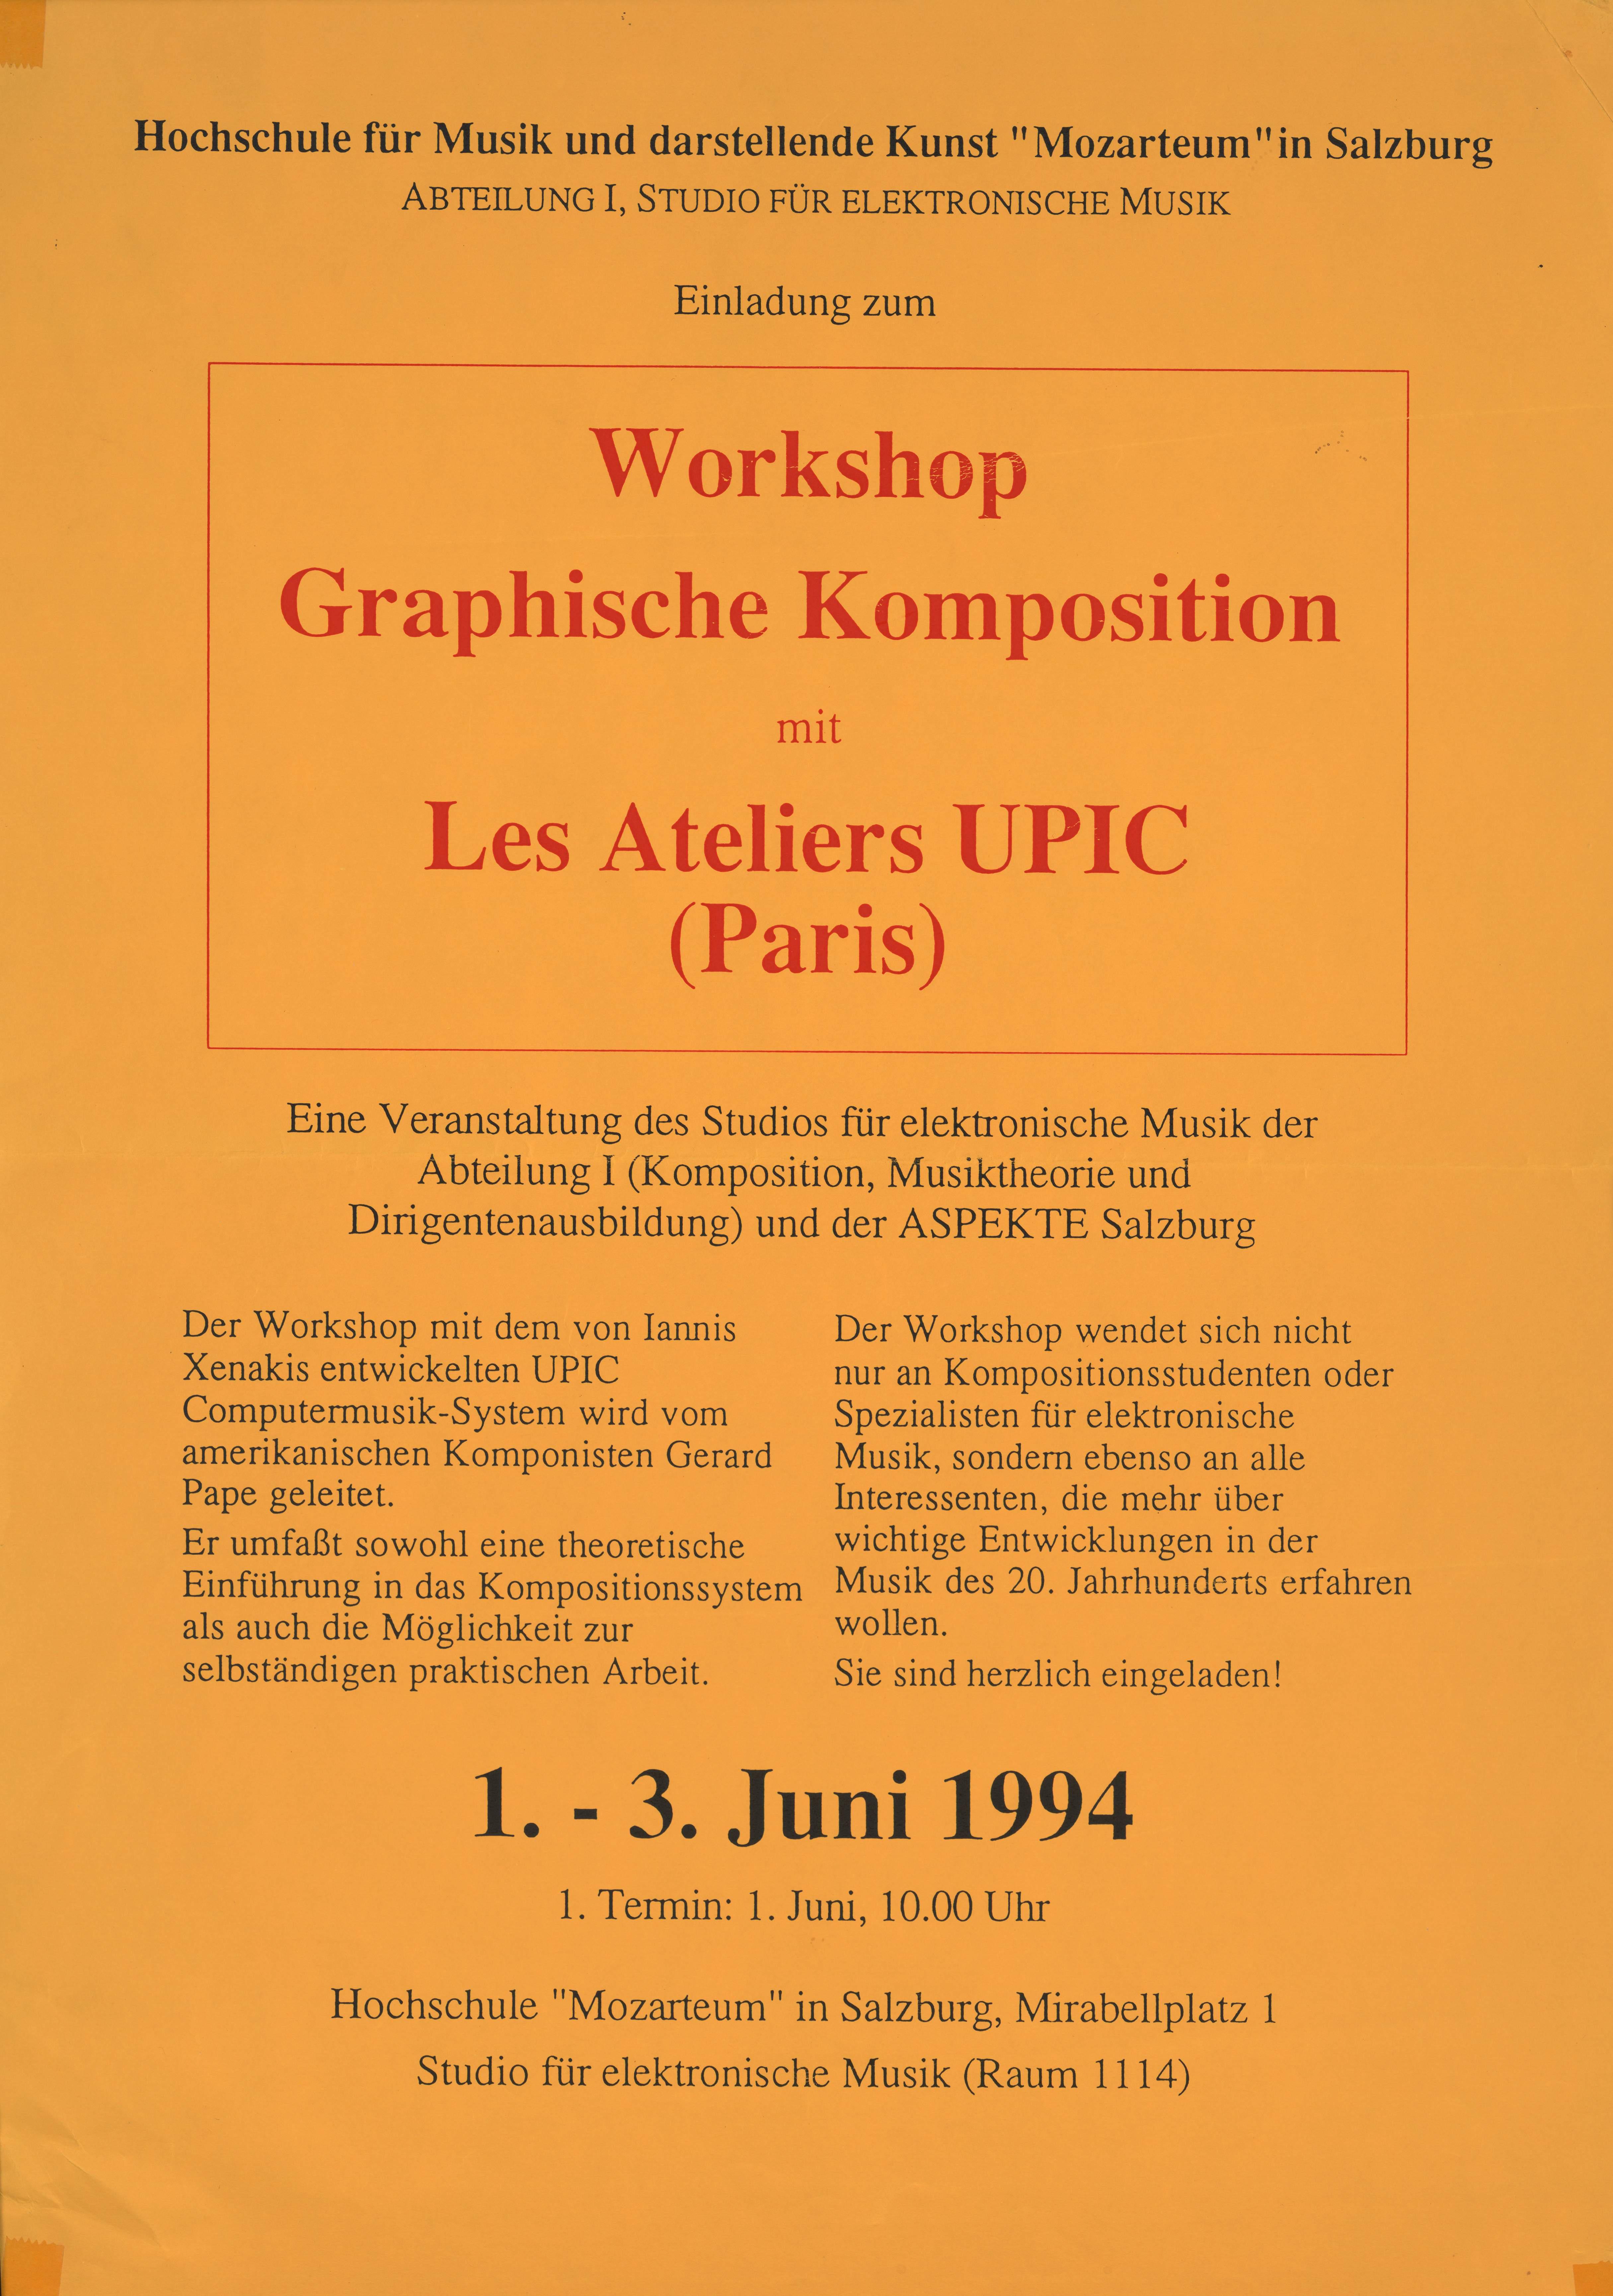 cover-les-ateliers-upic-workshop